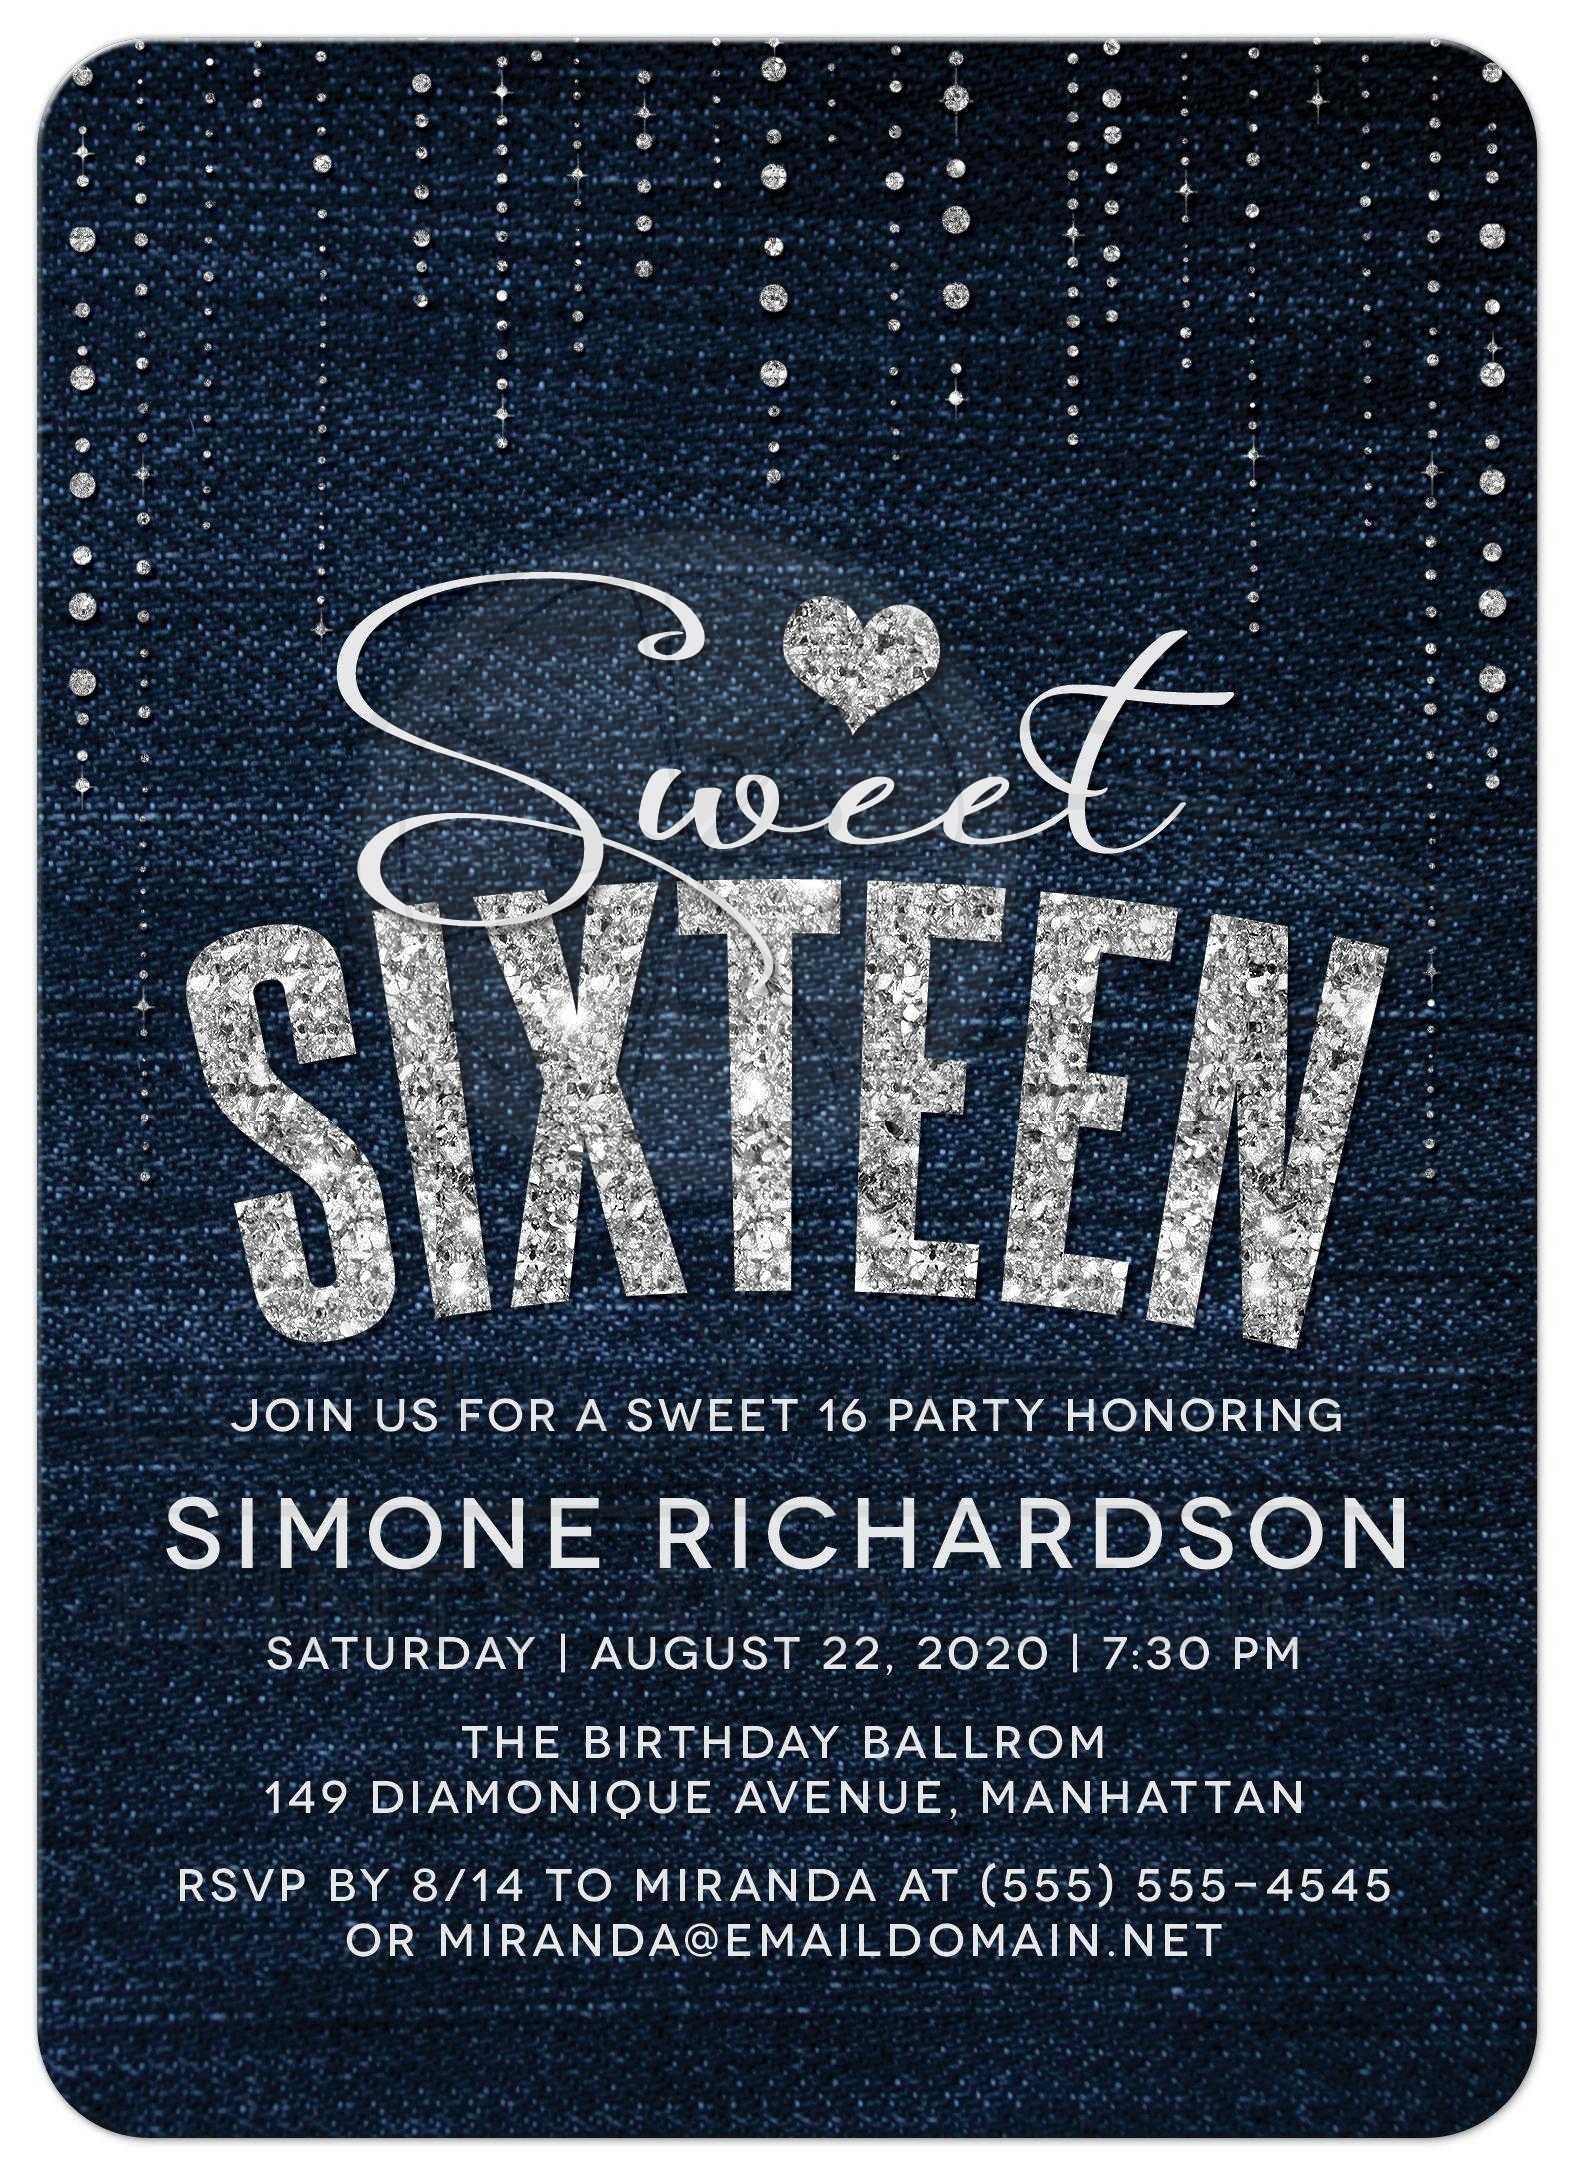 Sweet 16 party invitations denim diamonds denim diamonds sweet 16 party invitations stopboris Image collections